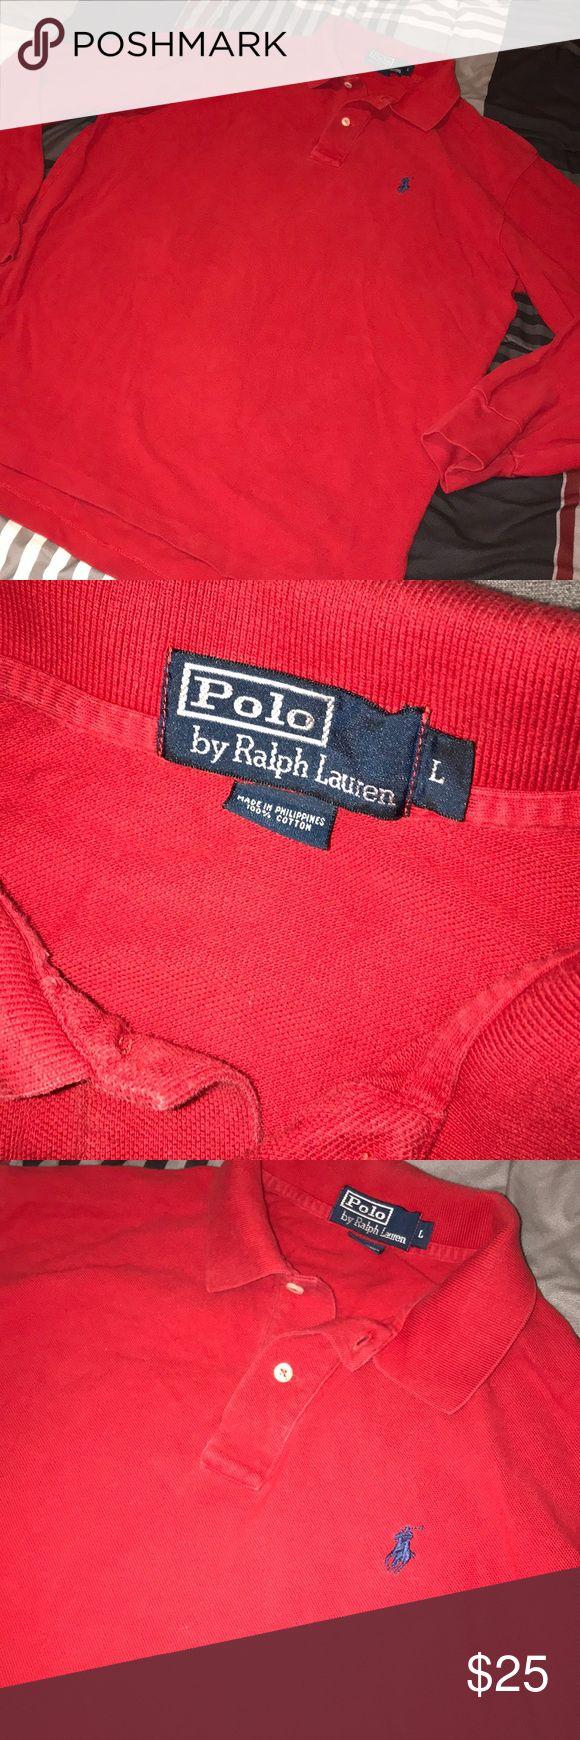 Men's Long Sleeve Polo Shirt - Blue Horse size Large. Men's Long Sleeve Polo Shirt - Blue Horse Polo by Ralph Lauren Shirts Polos